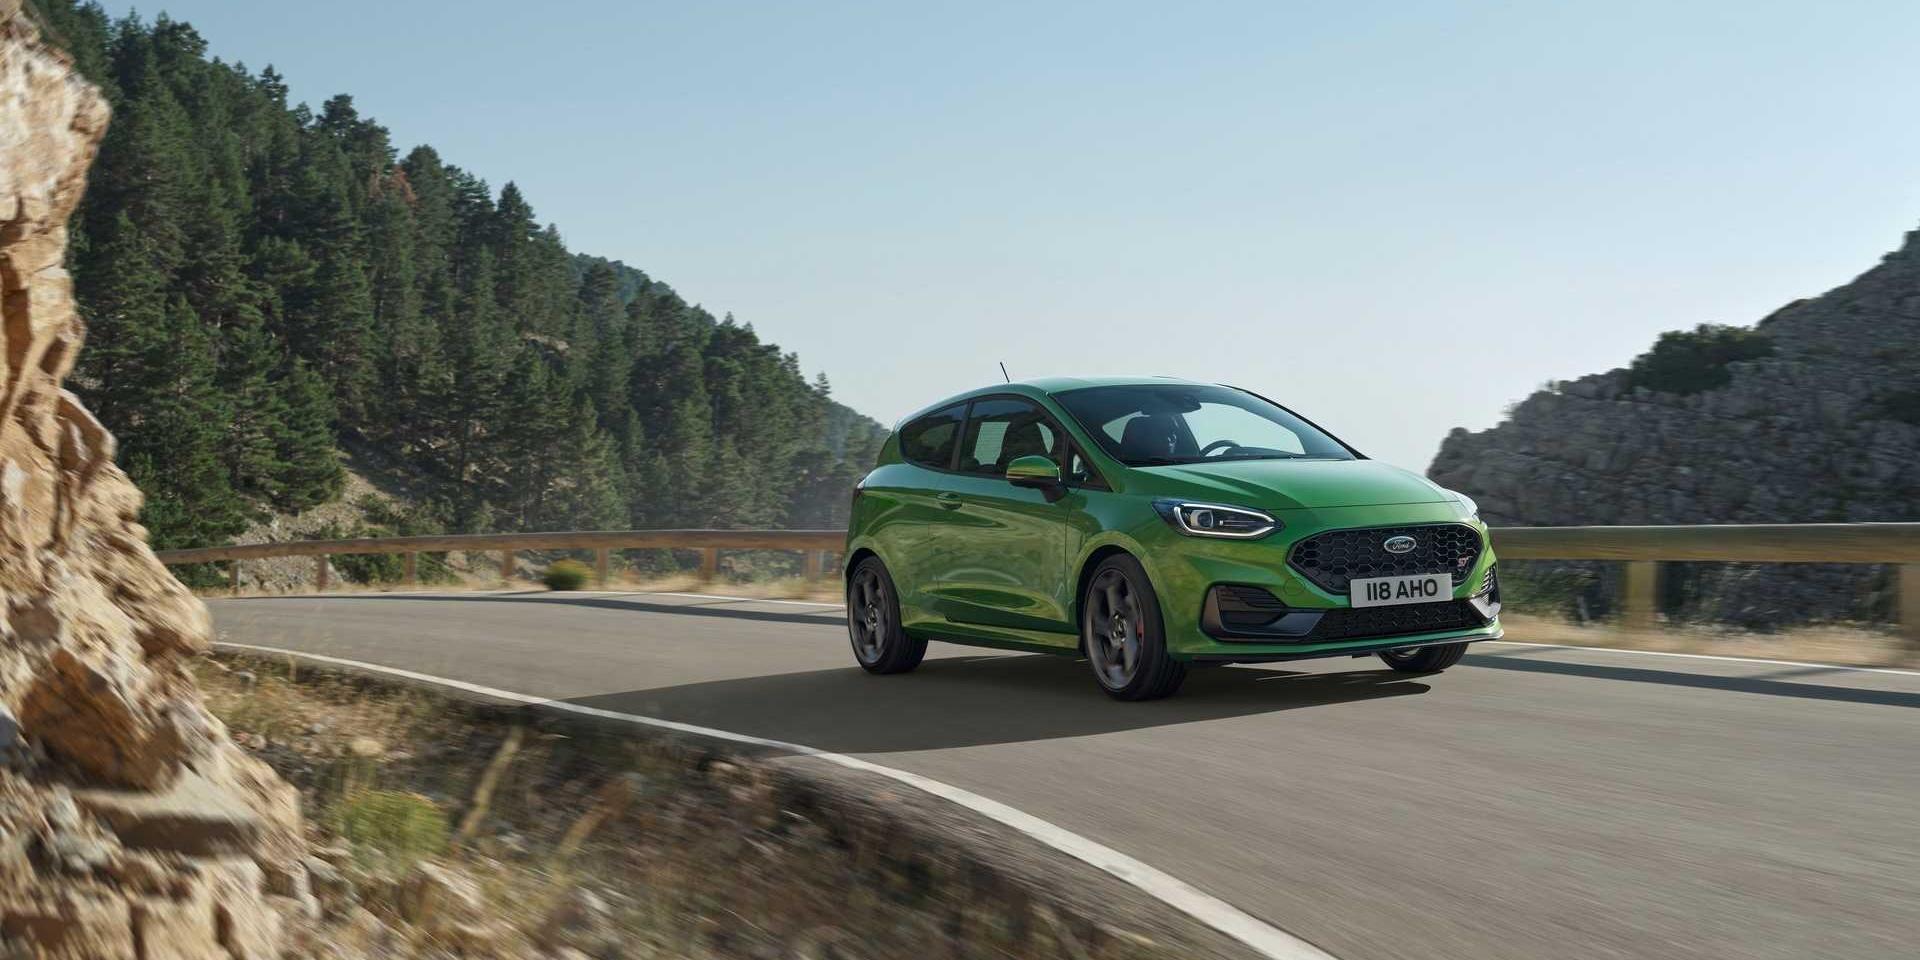 Ford Fiesta小改款擁有48V!LED矩陣式頭燈上身 ST性能表現更好!